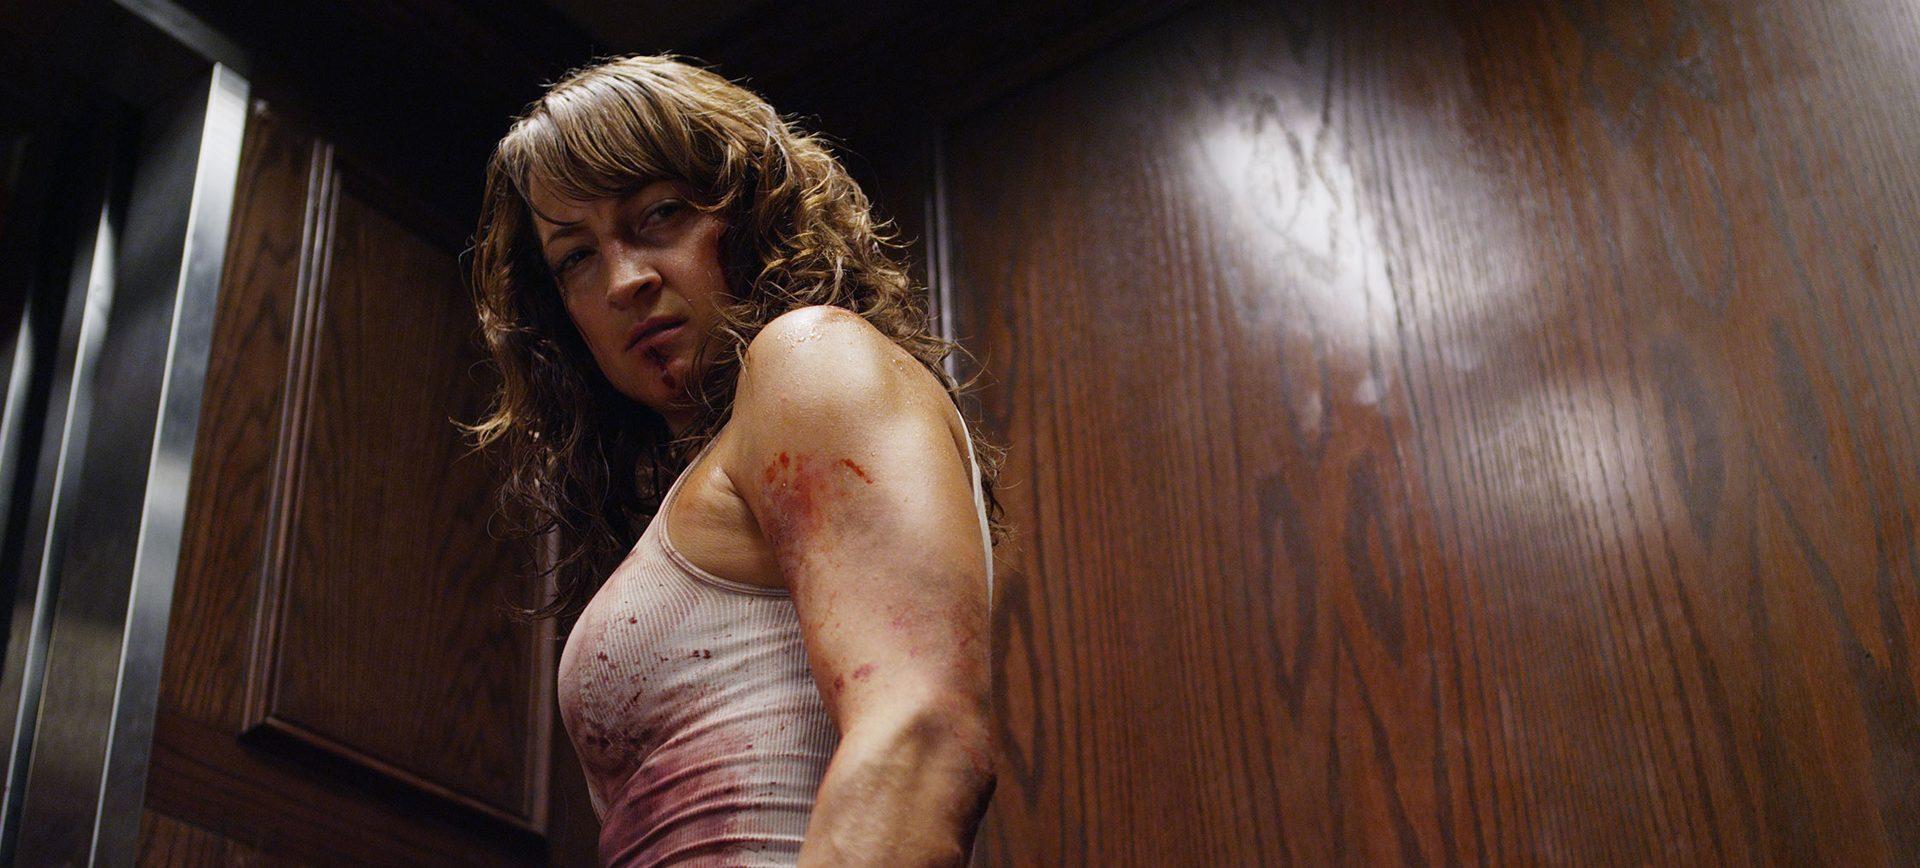 Raze. Zoe Bell as Sabrina